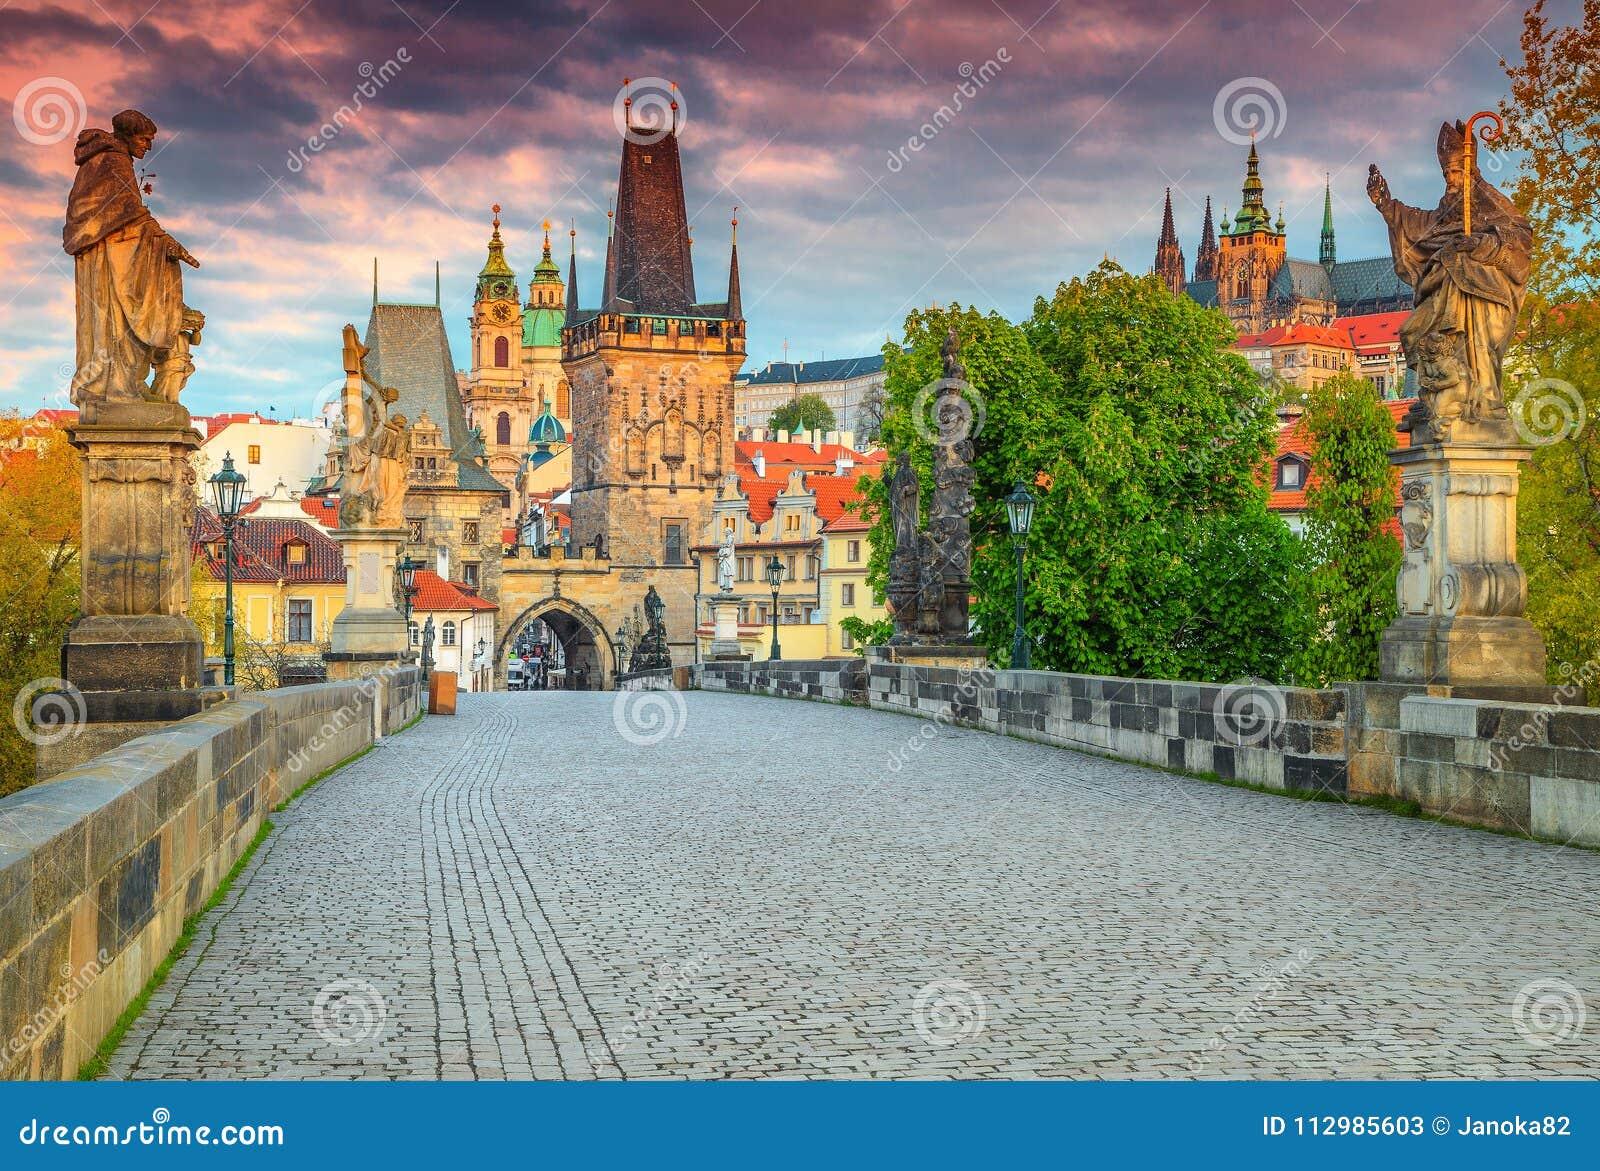 Spectacular medieval stone Charles bridge with statues, Prague, Czech Republic